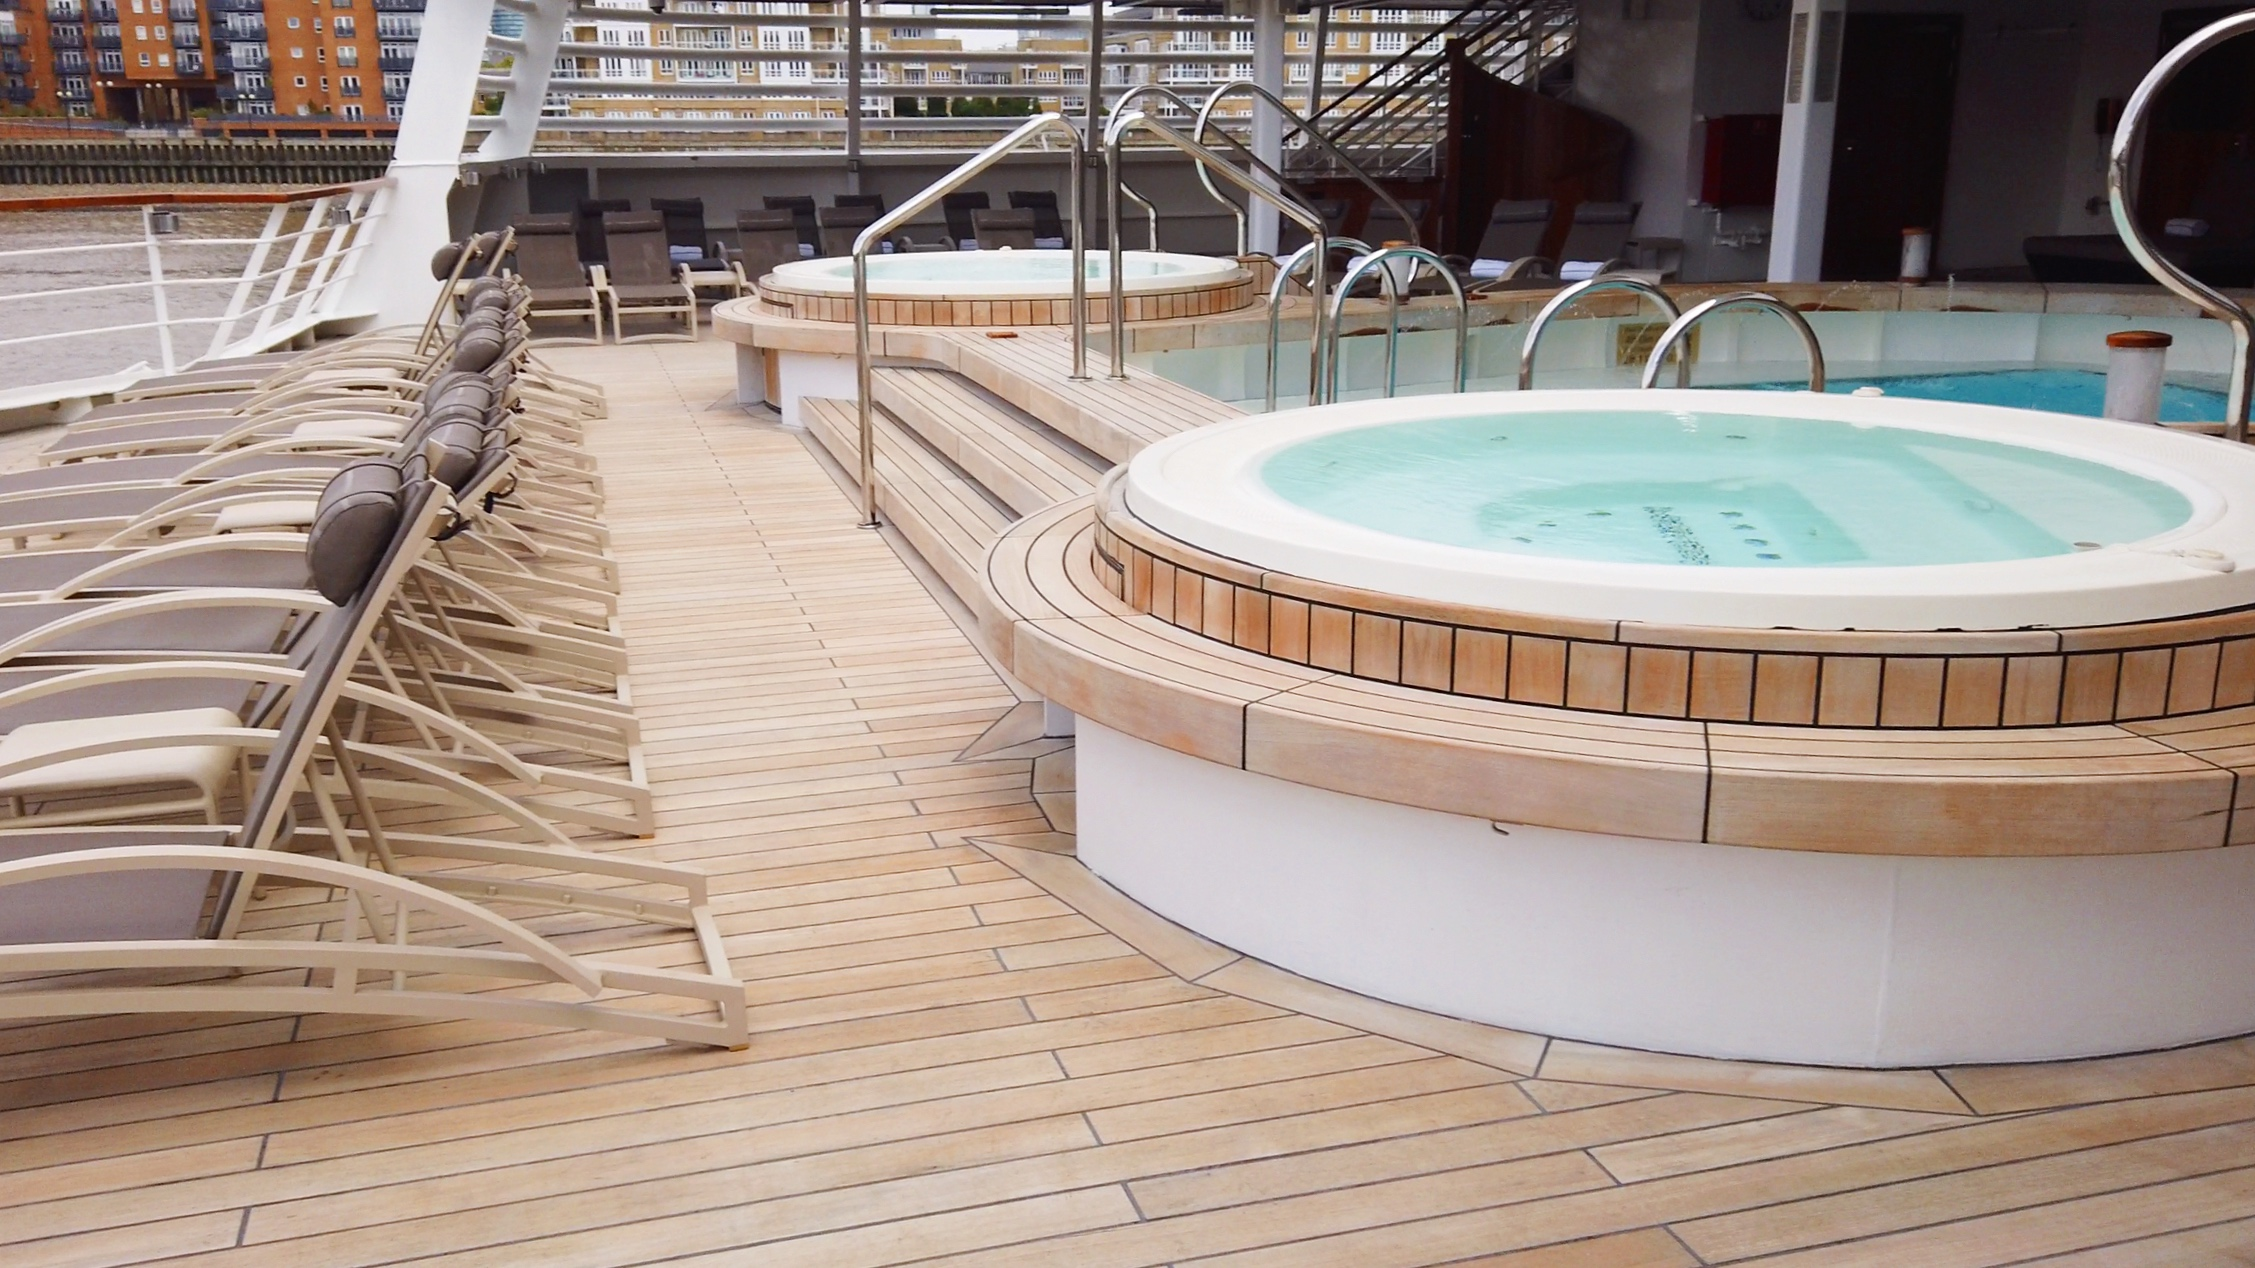 Deck 5 aft pool deck.